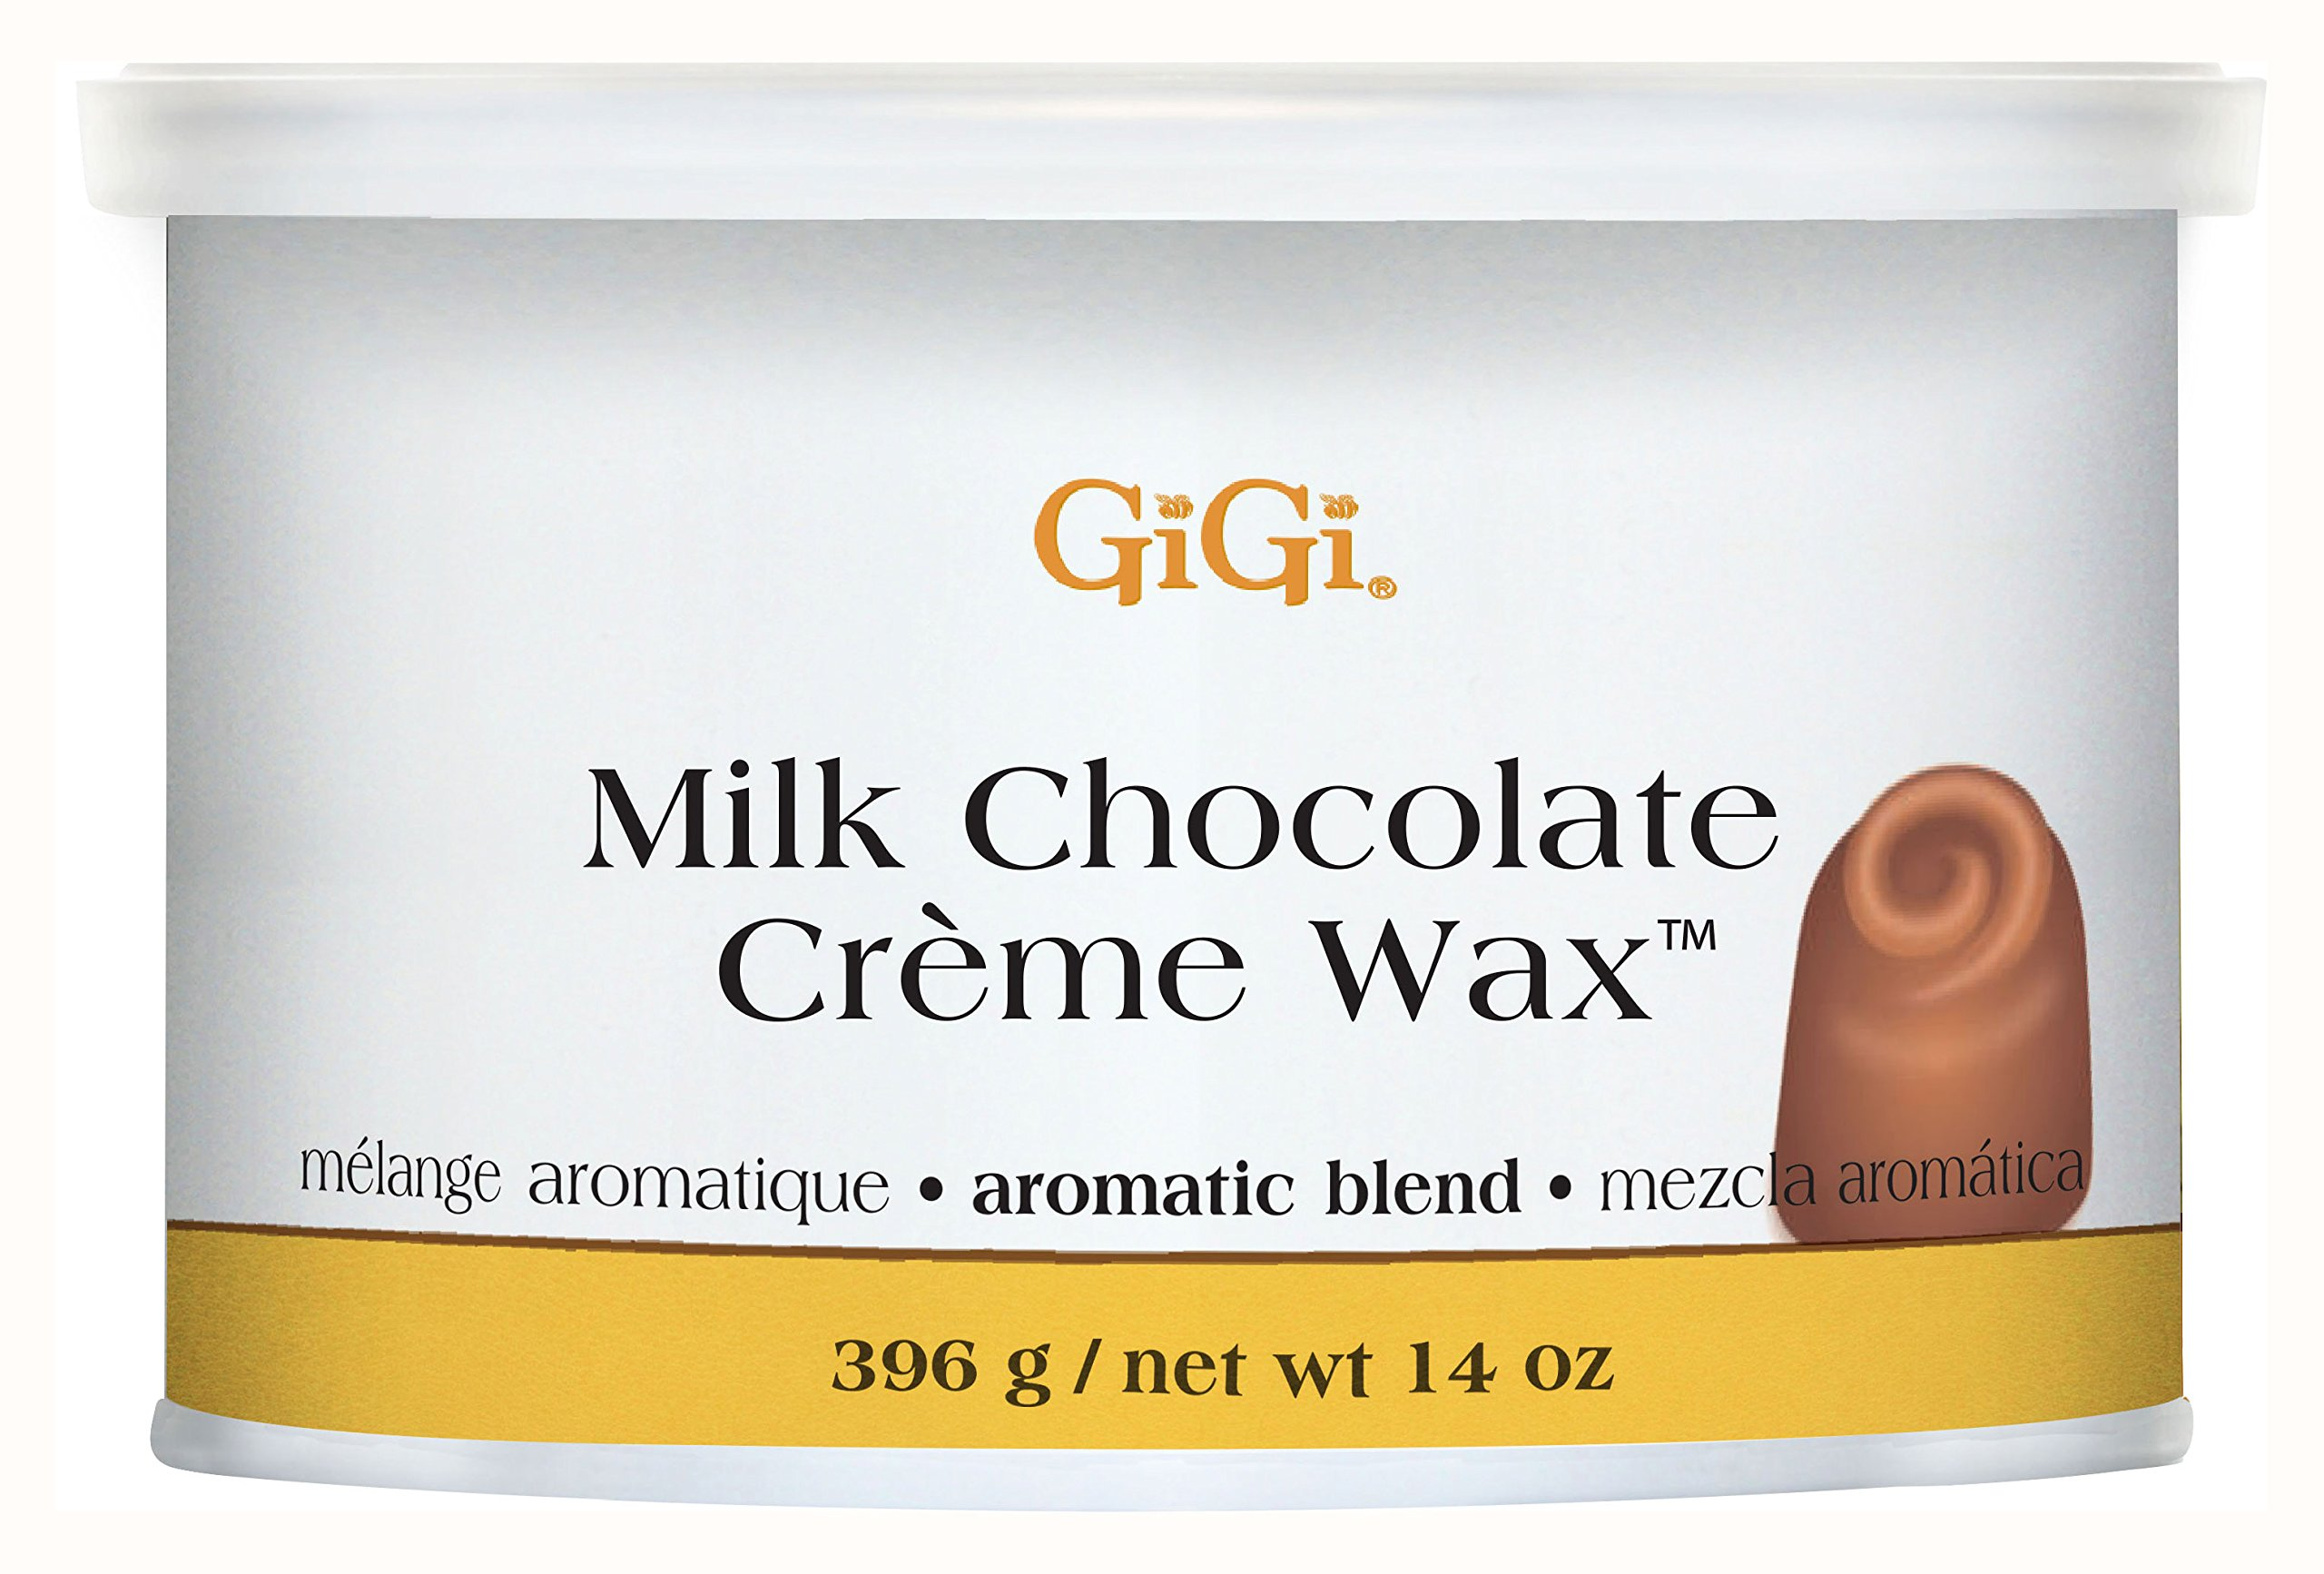 Gigi Milk Chocolate Creme Wax, Milk Chocolate, 14 Ounce